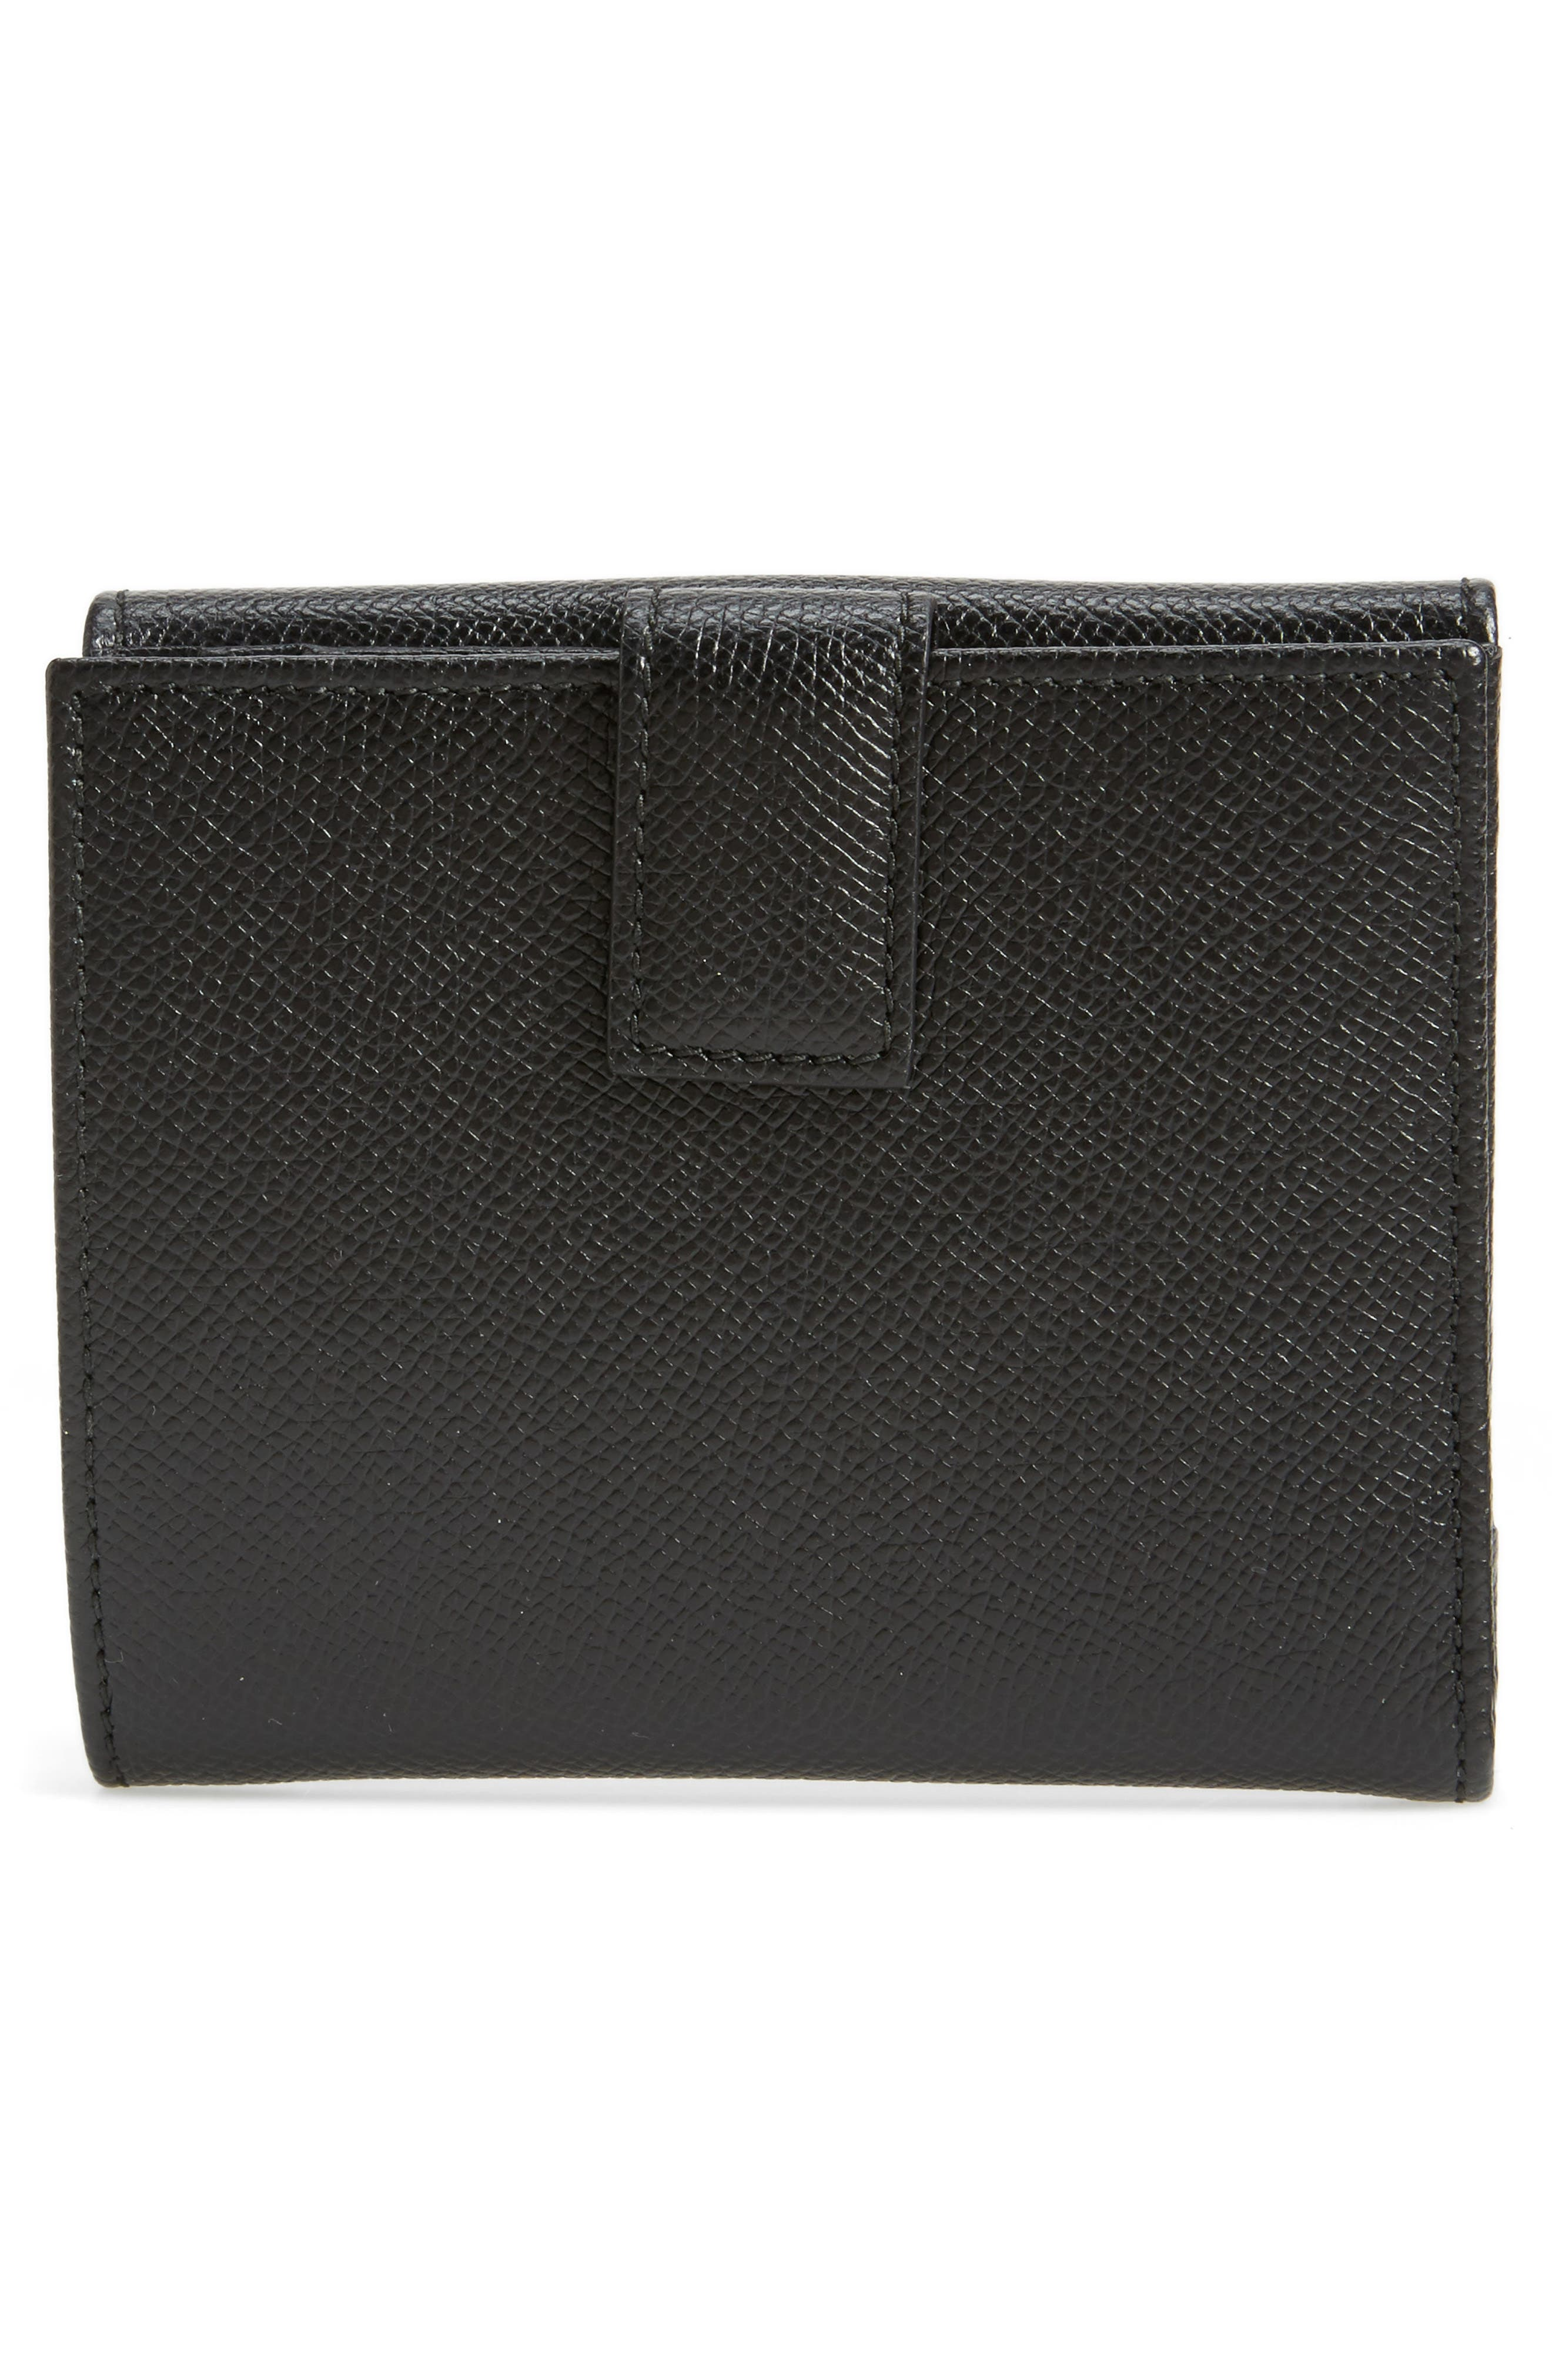 Icona Medium French Wallet,                             Alternate thumbnail 4, color,                             070